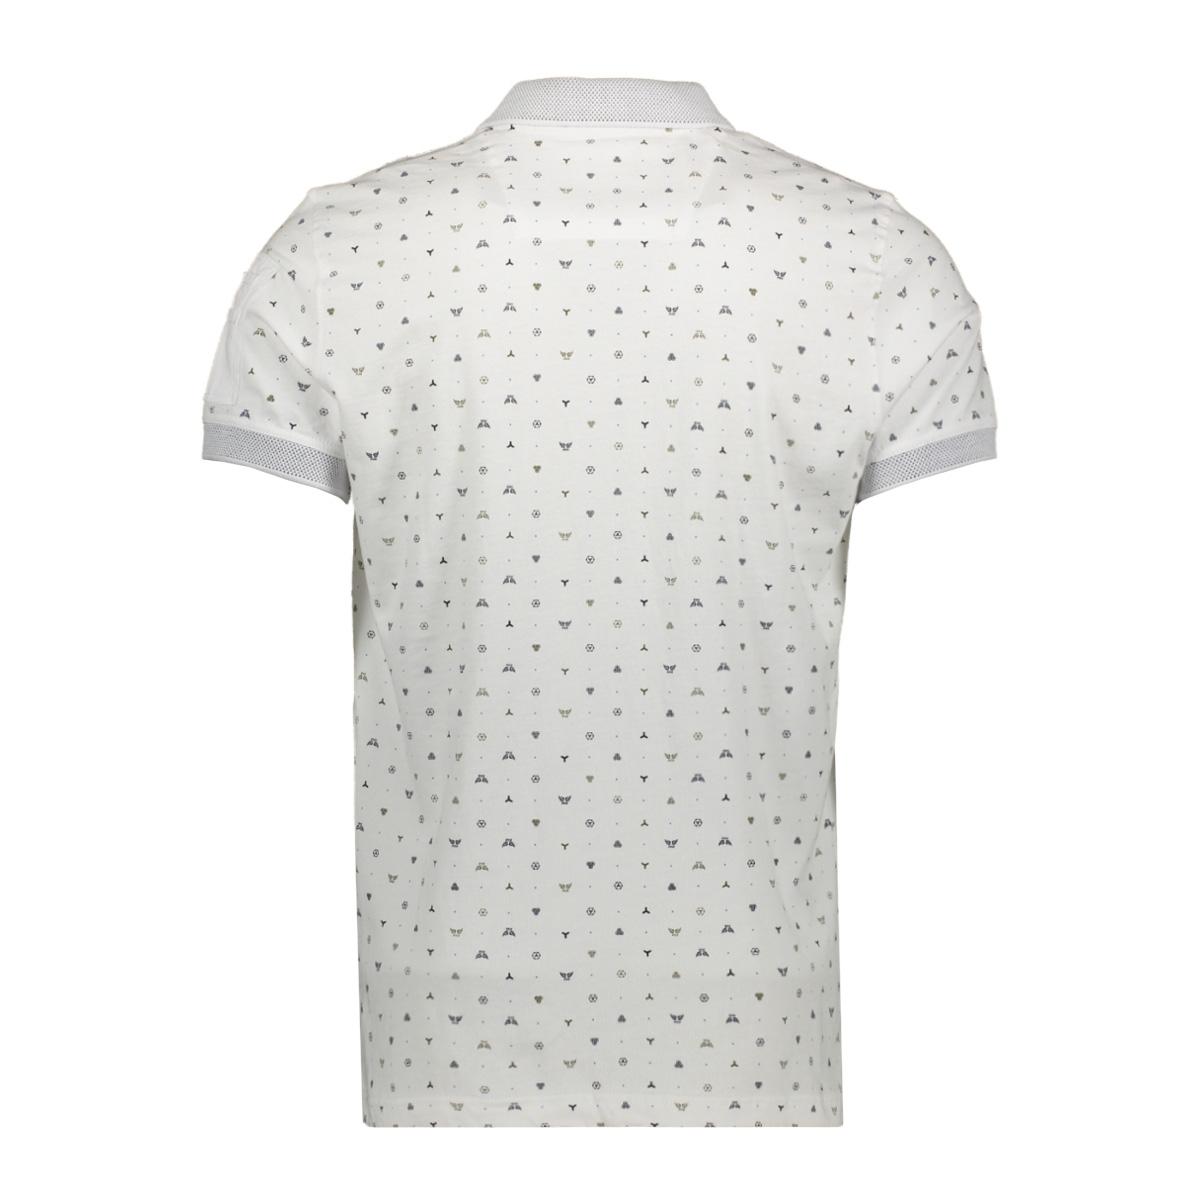 single jersey short sleeve polo ppss202860 pme legend polo 7003